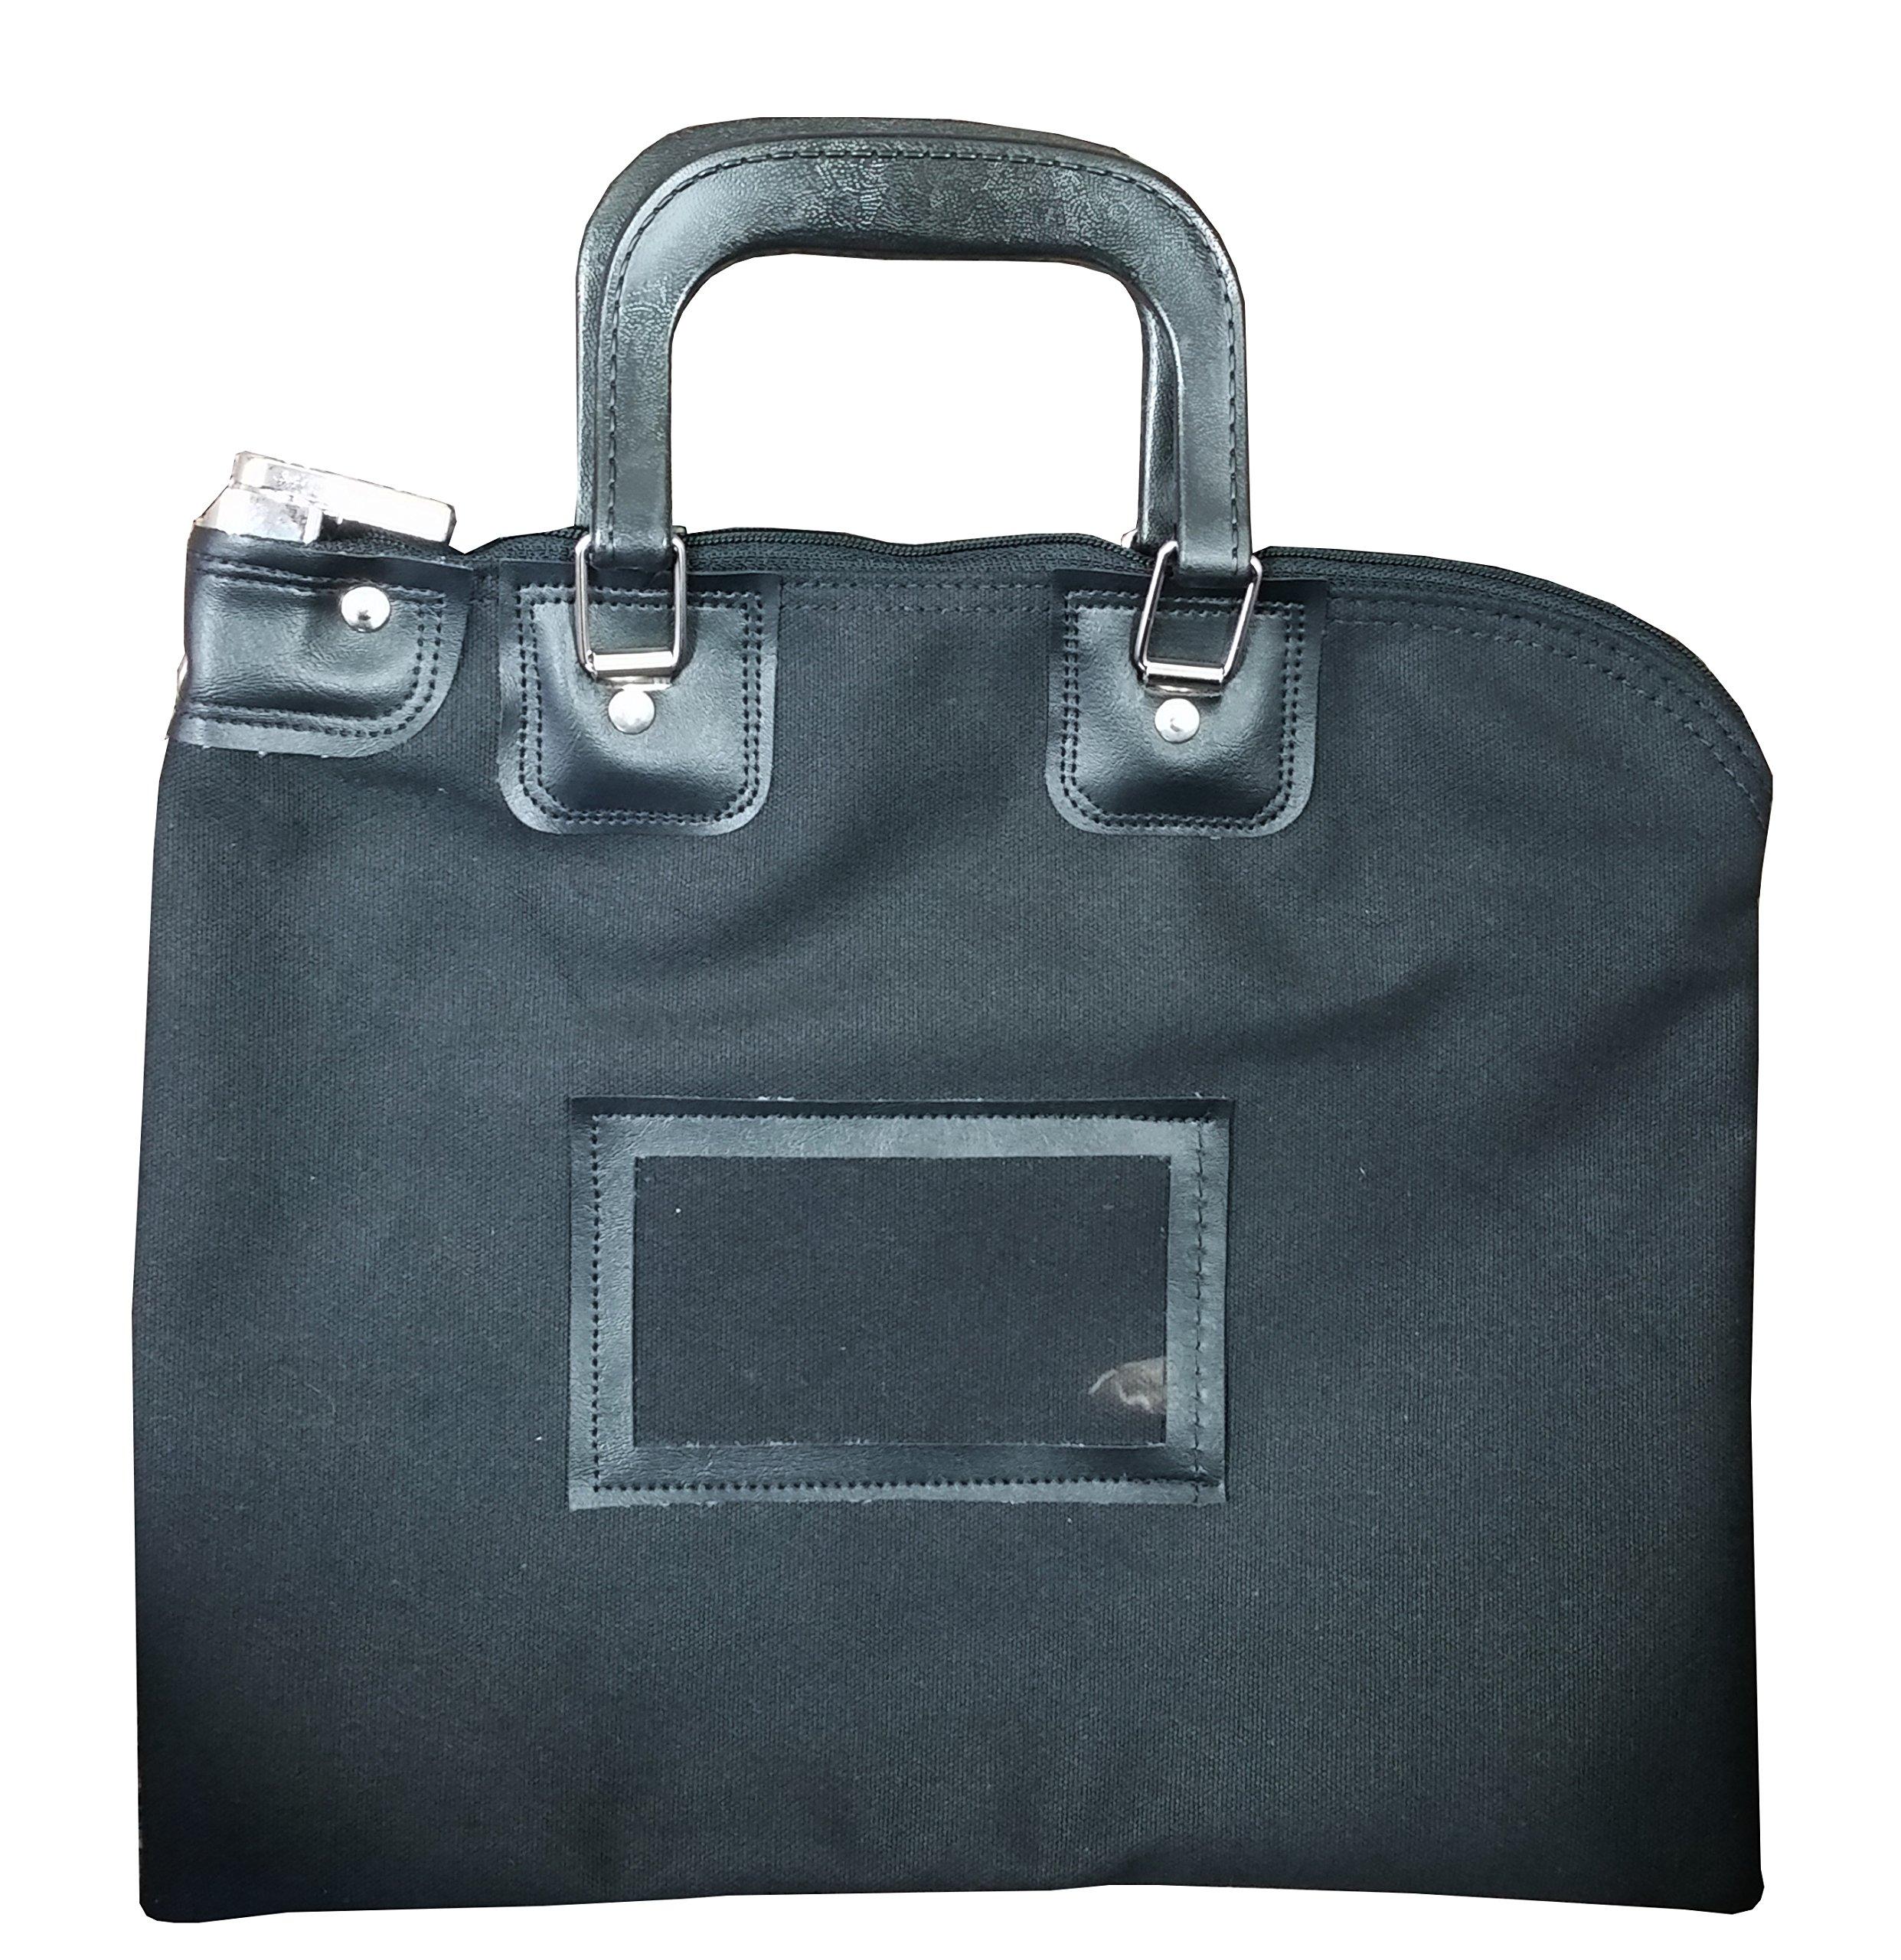 Locking Bank Bag Canvas with Hard Handles Black by Cardinal bag supplies